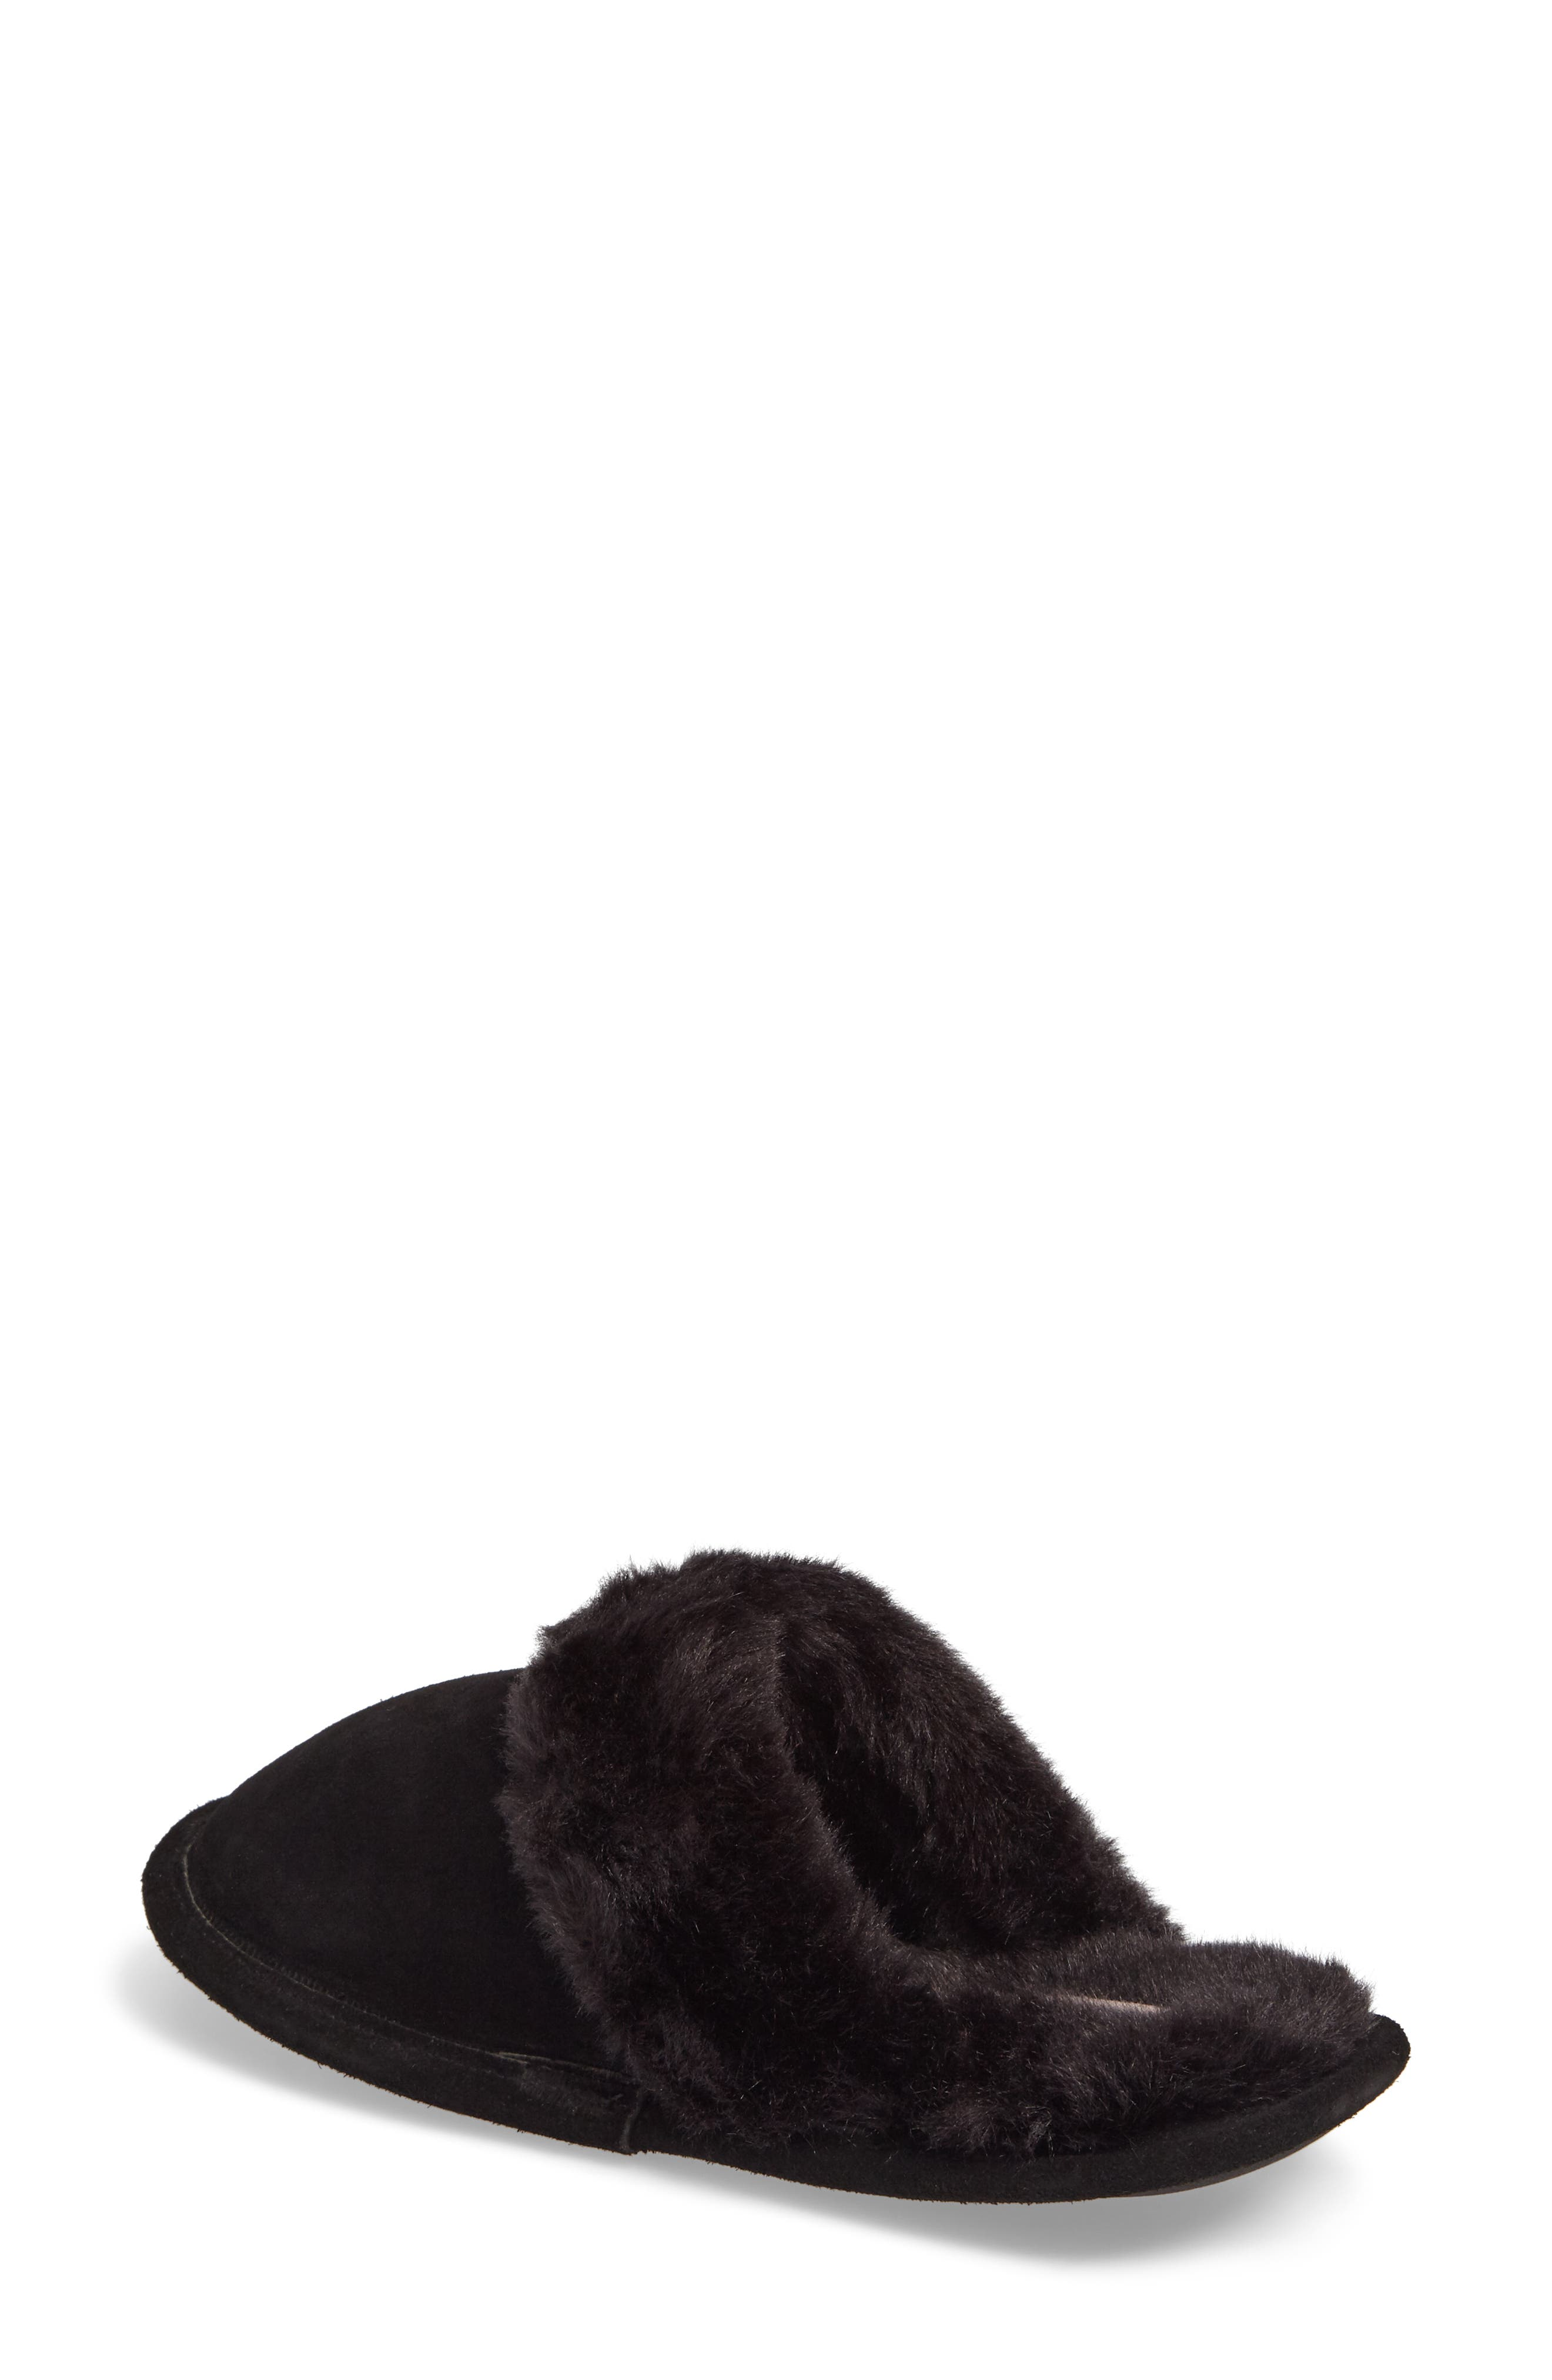 Pammy Faux Fur Slipper,                             Alternate thumbnail 2, color,                             001